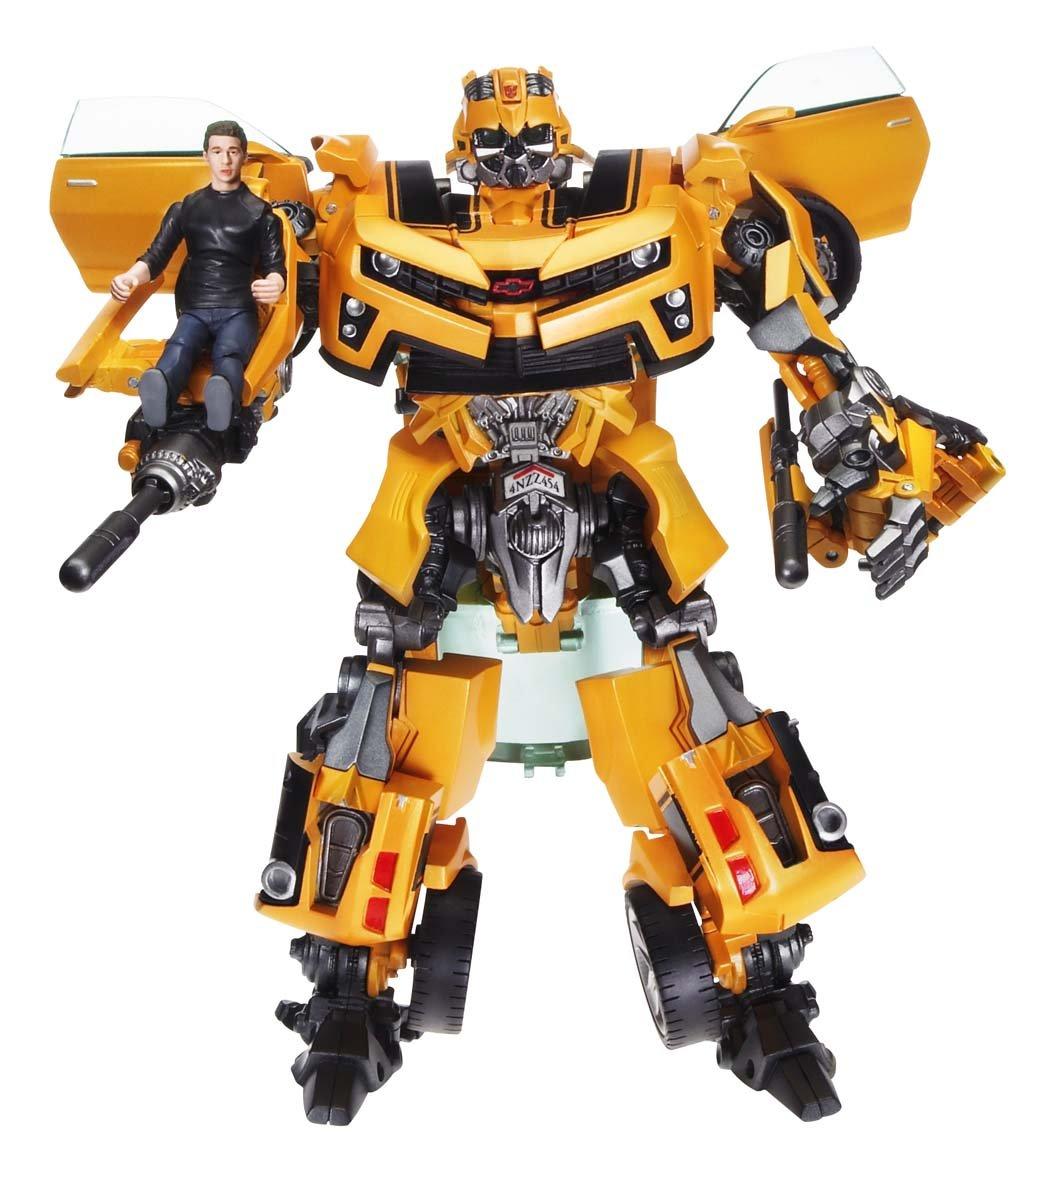 amazon com transformers human alliance bumblebee with sam toys